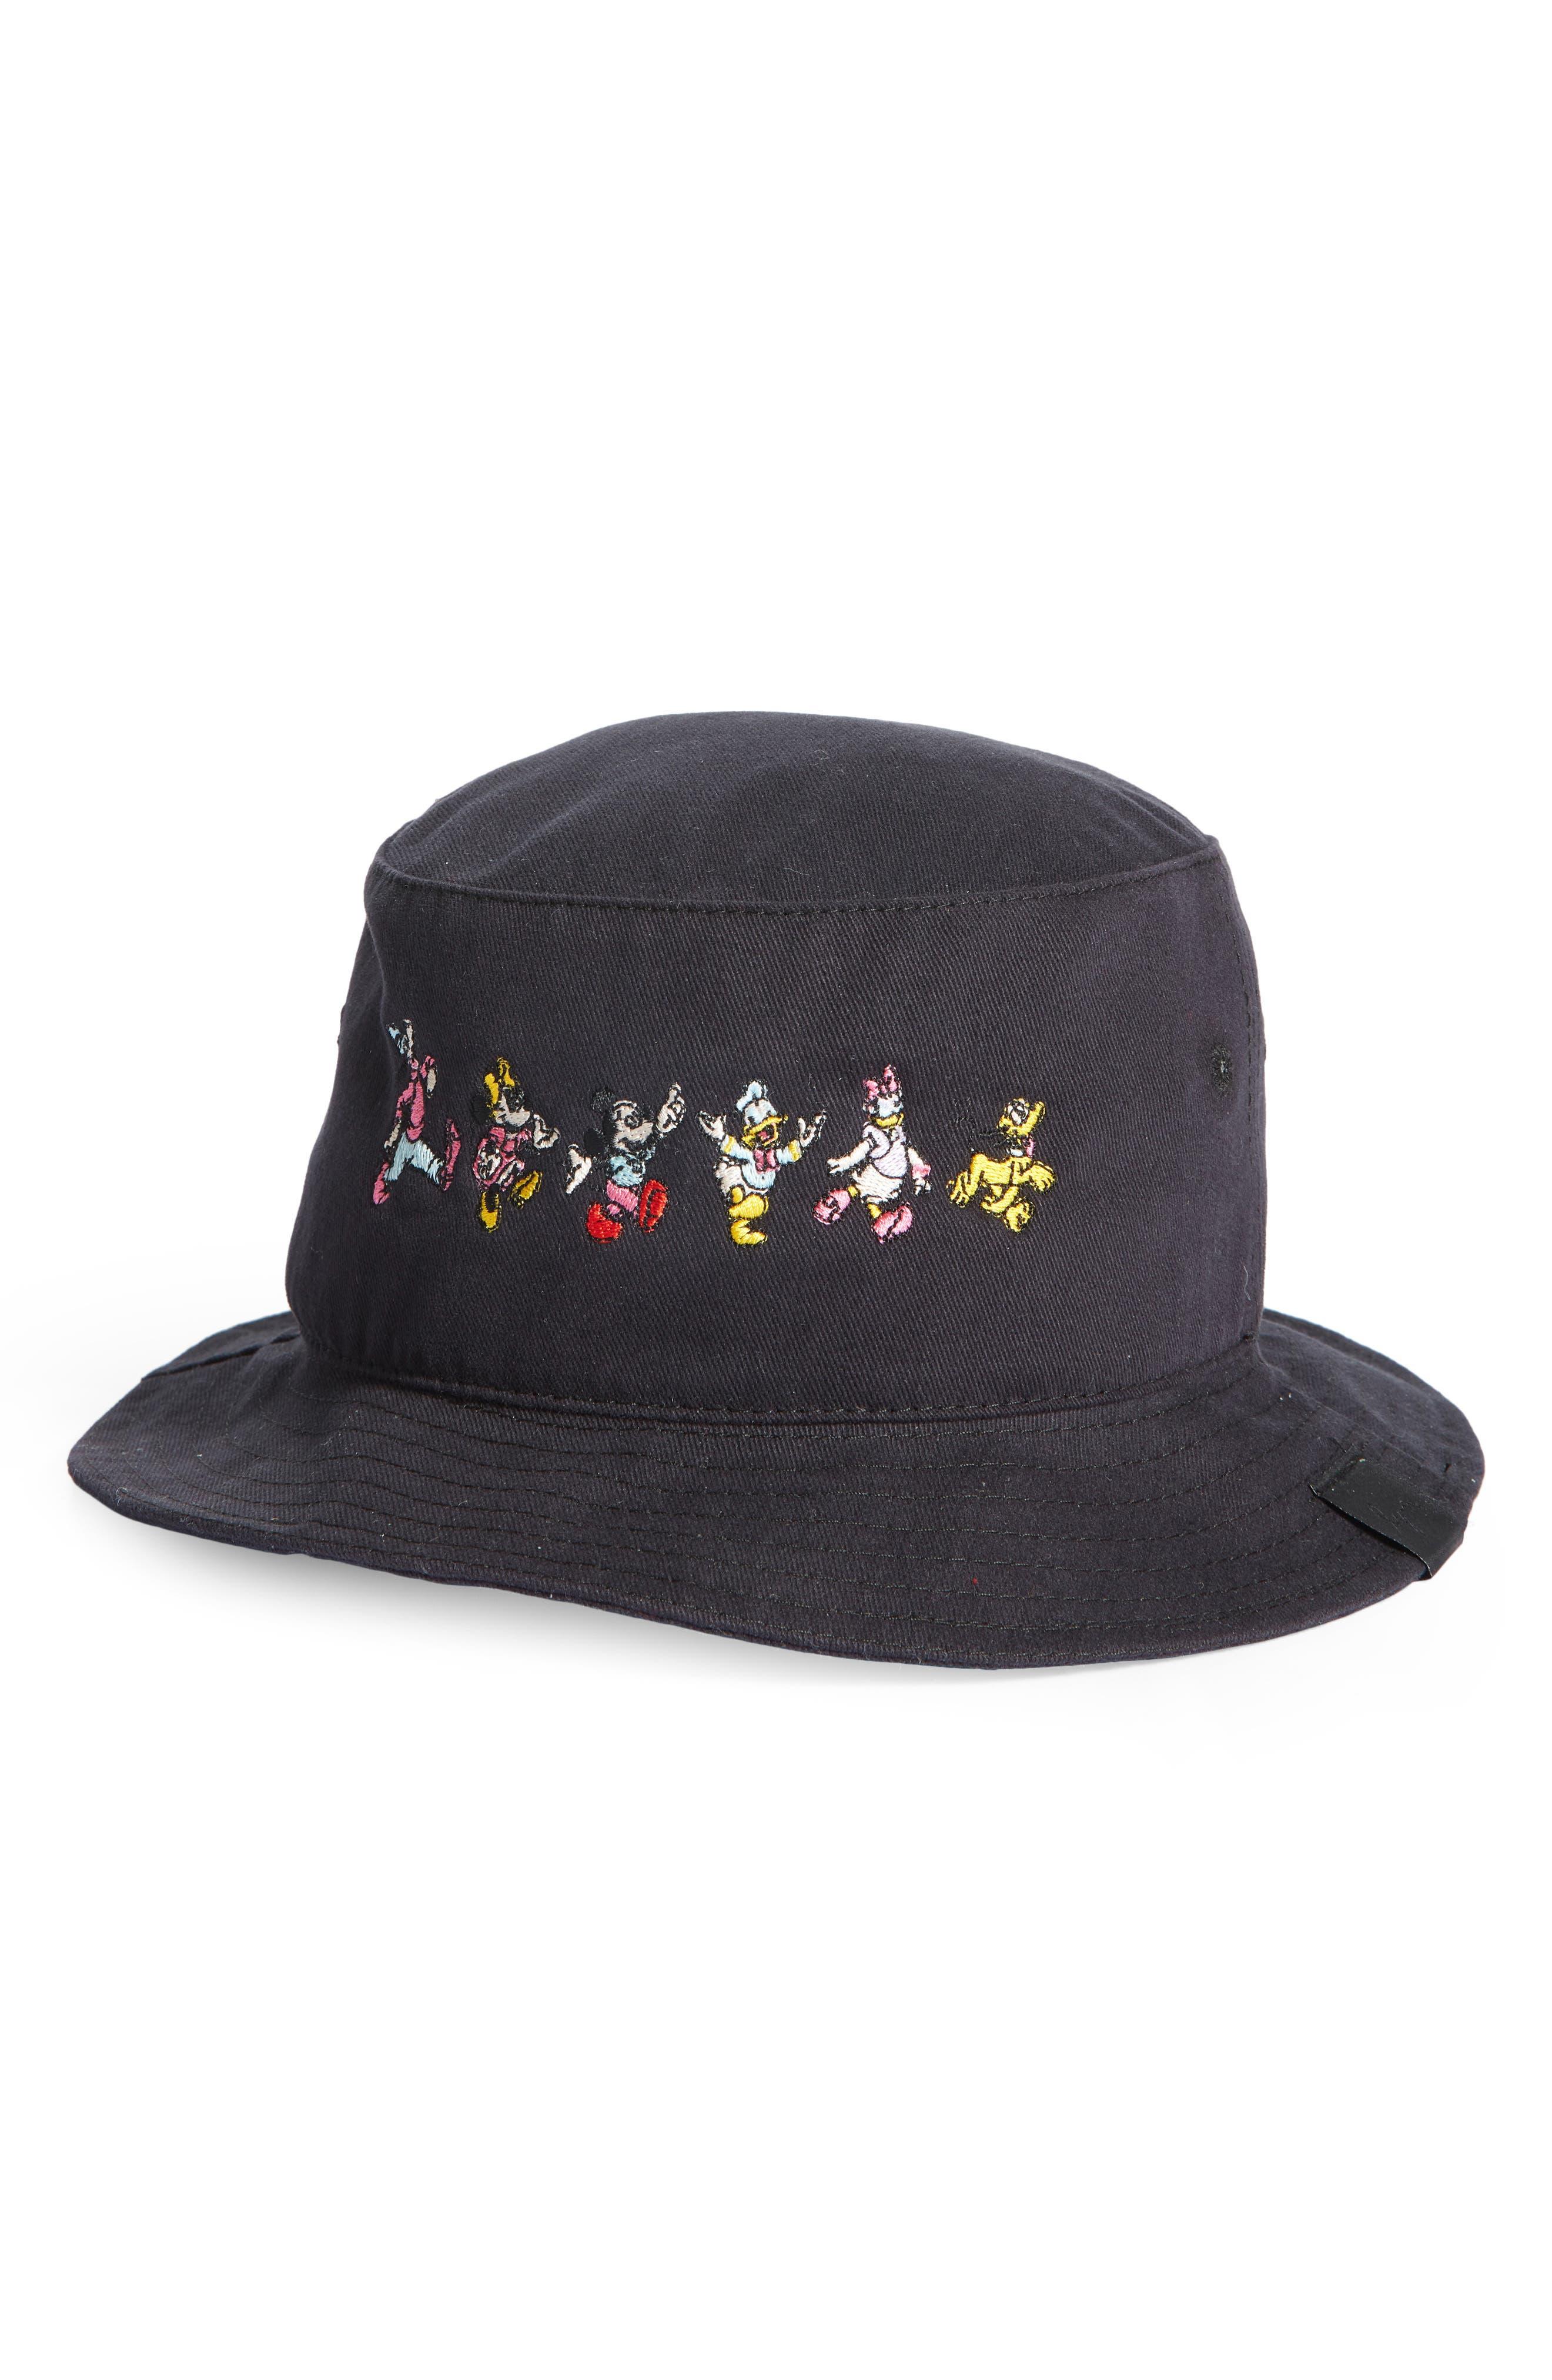 Kids' Sensational 6 Embroidered Bucket Hat